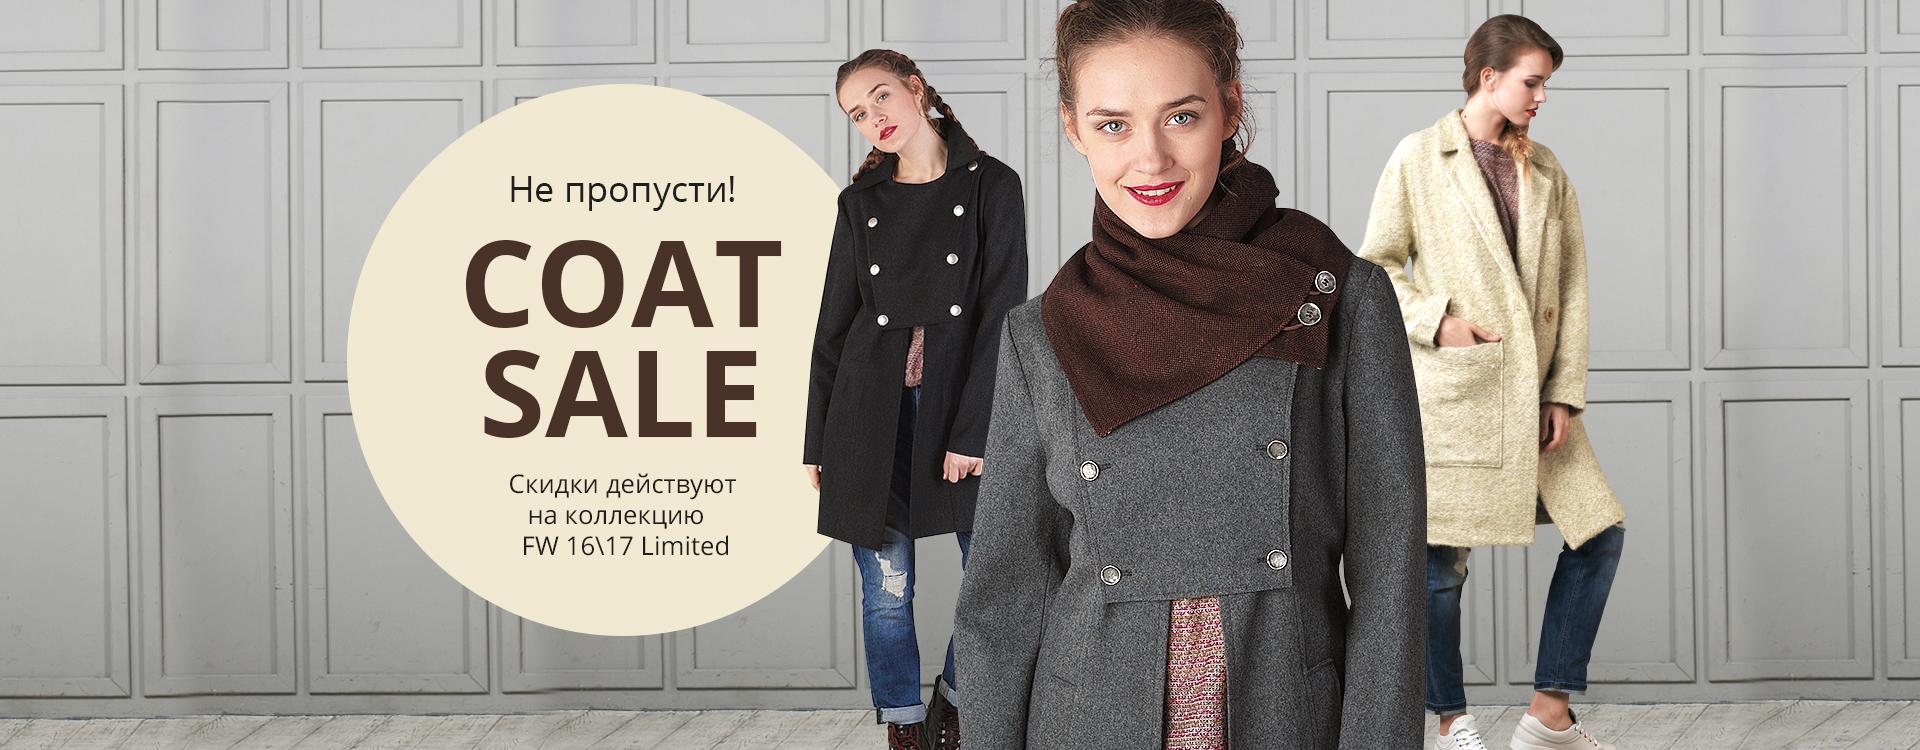 dsisters_sale_coat_02_fin